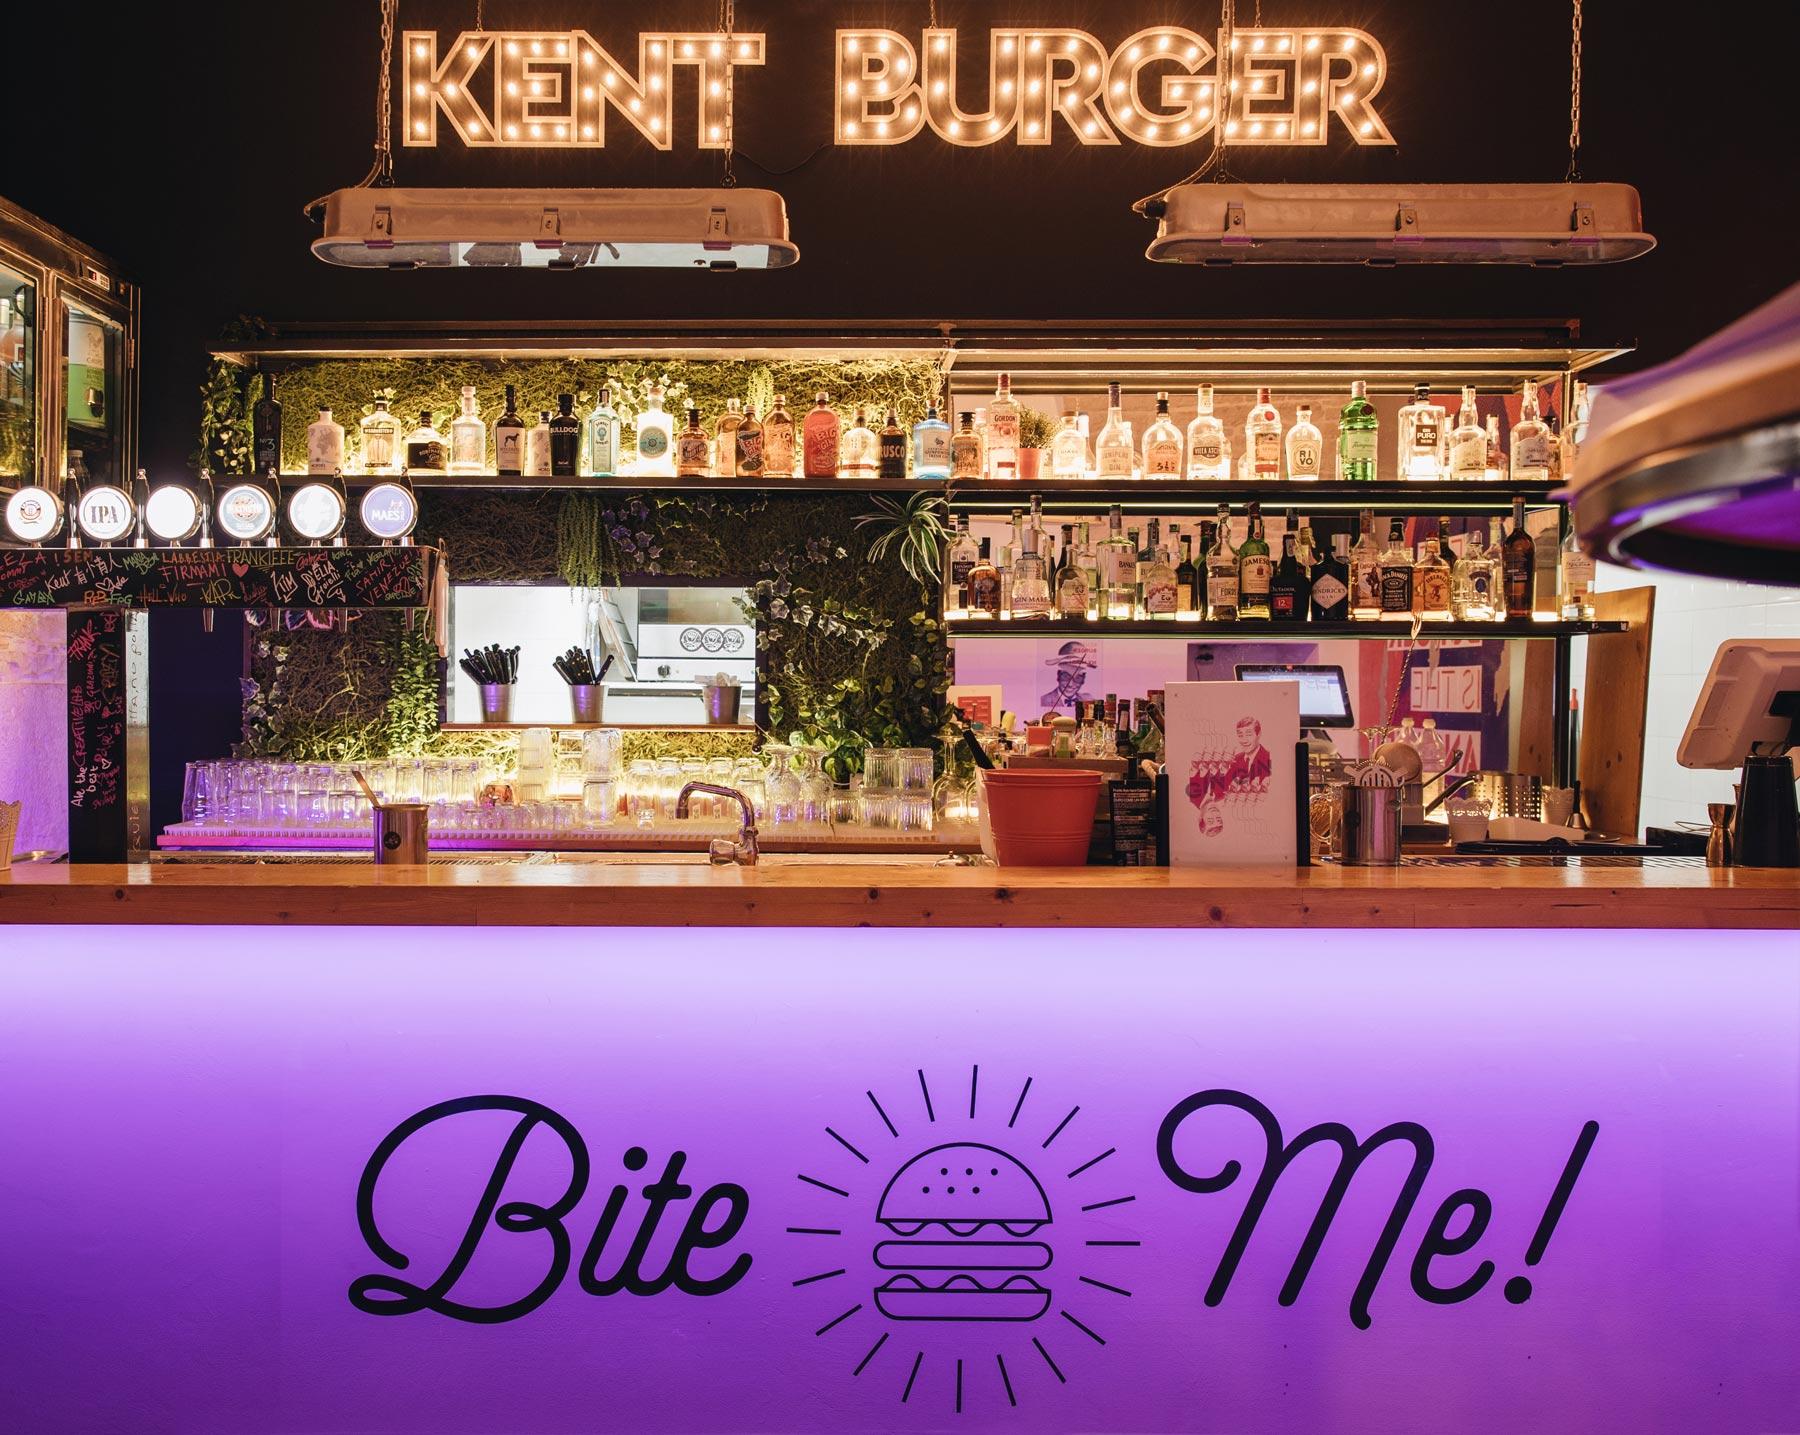 Kent Burger Terlizzi Interno Locale